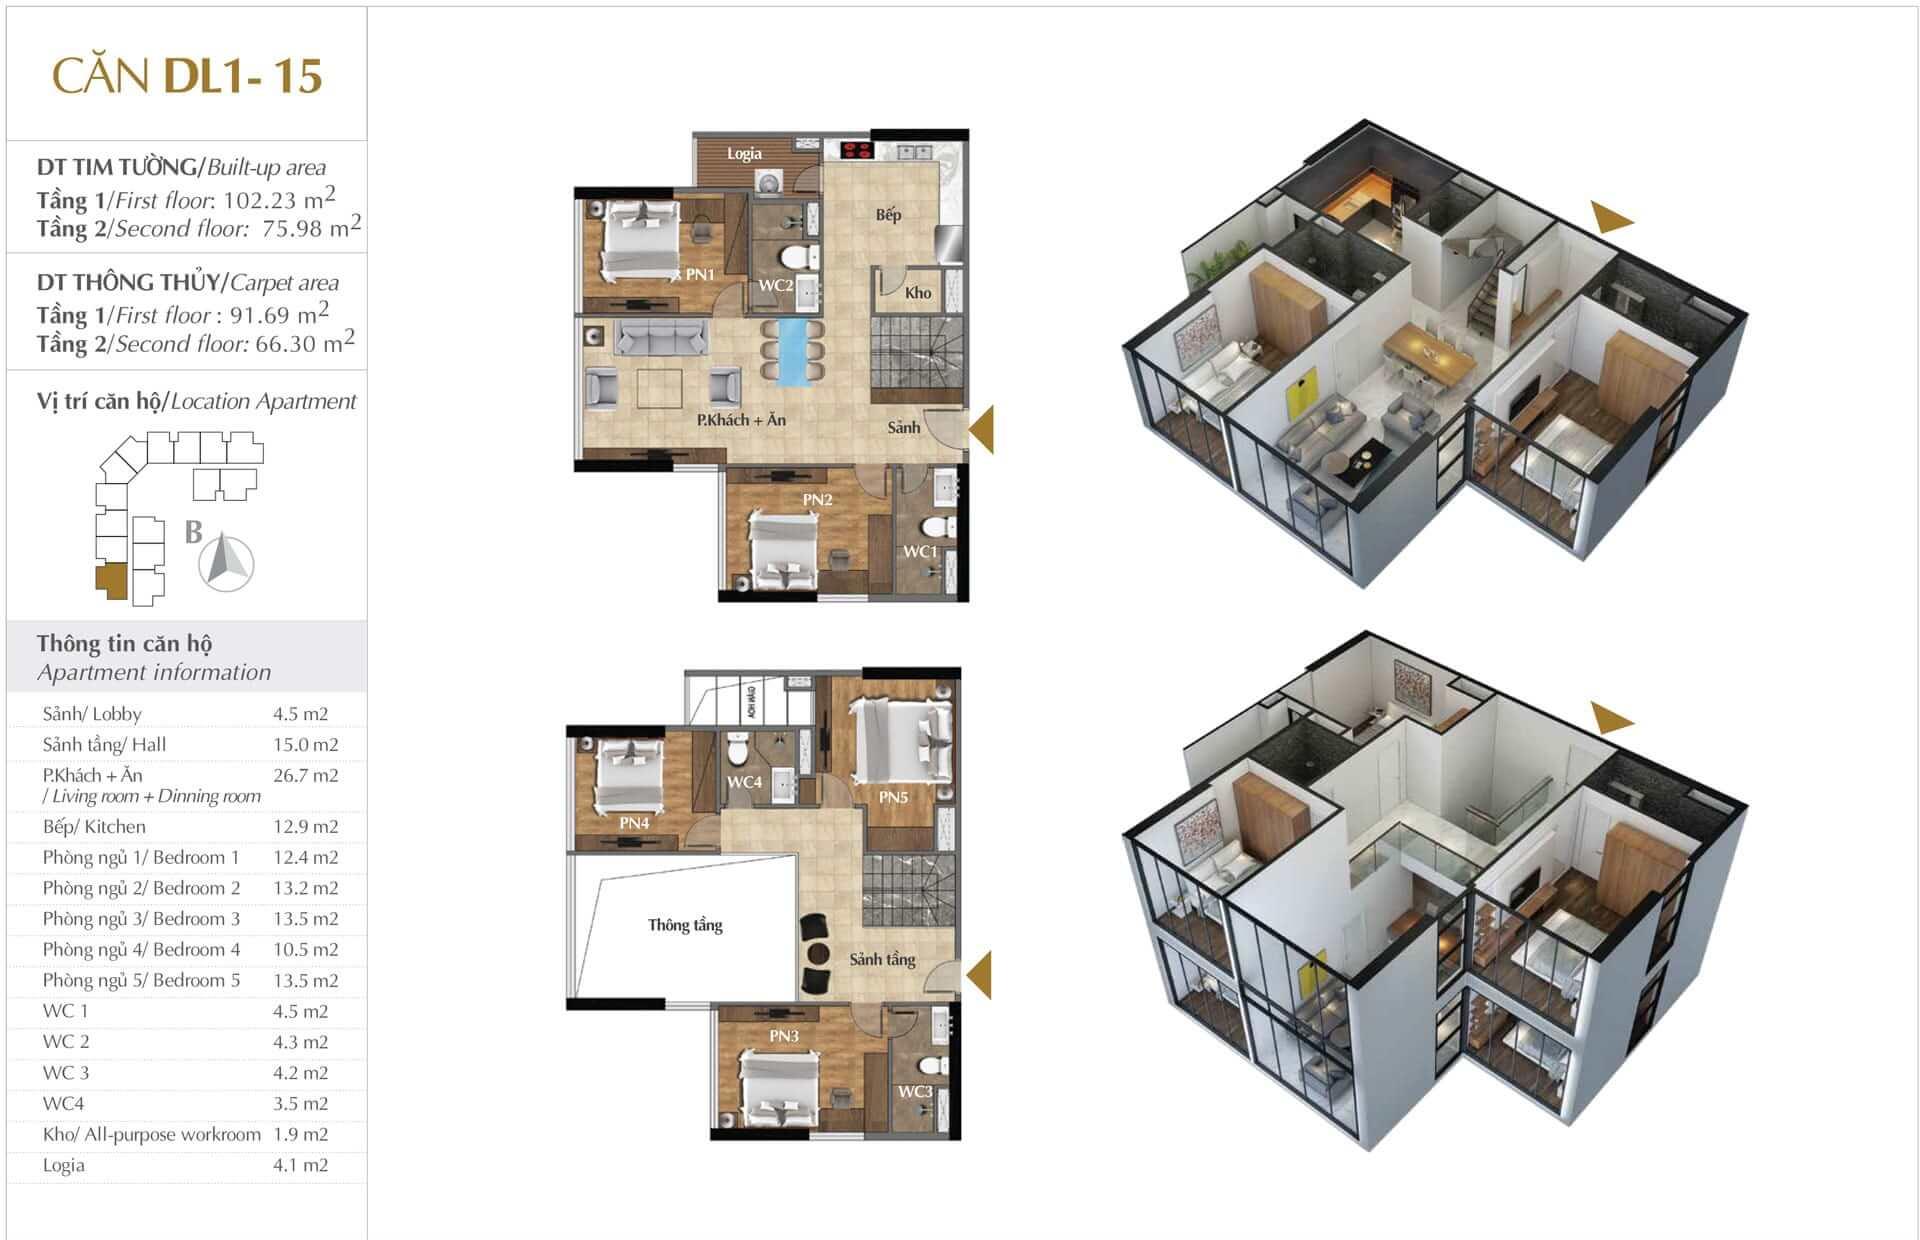 Thiết kế căn DL1 - 15